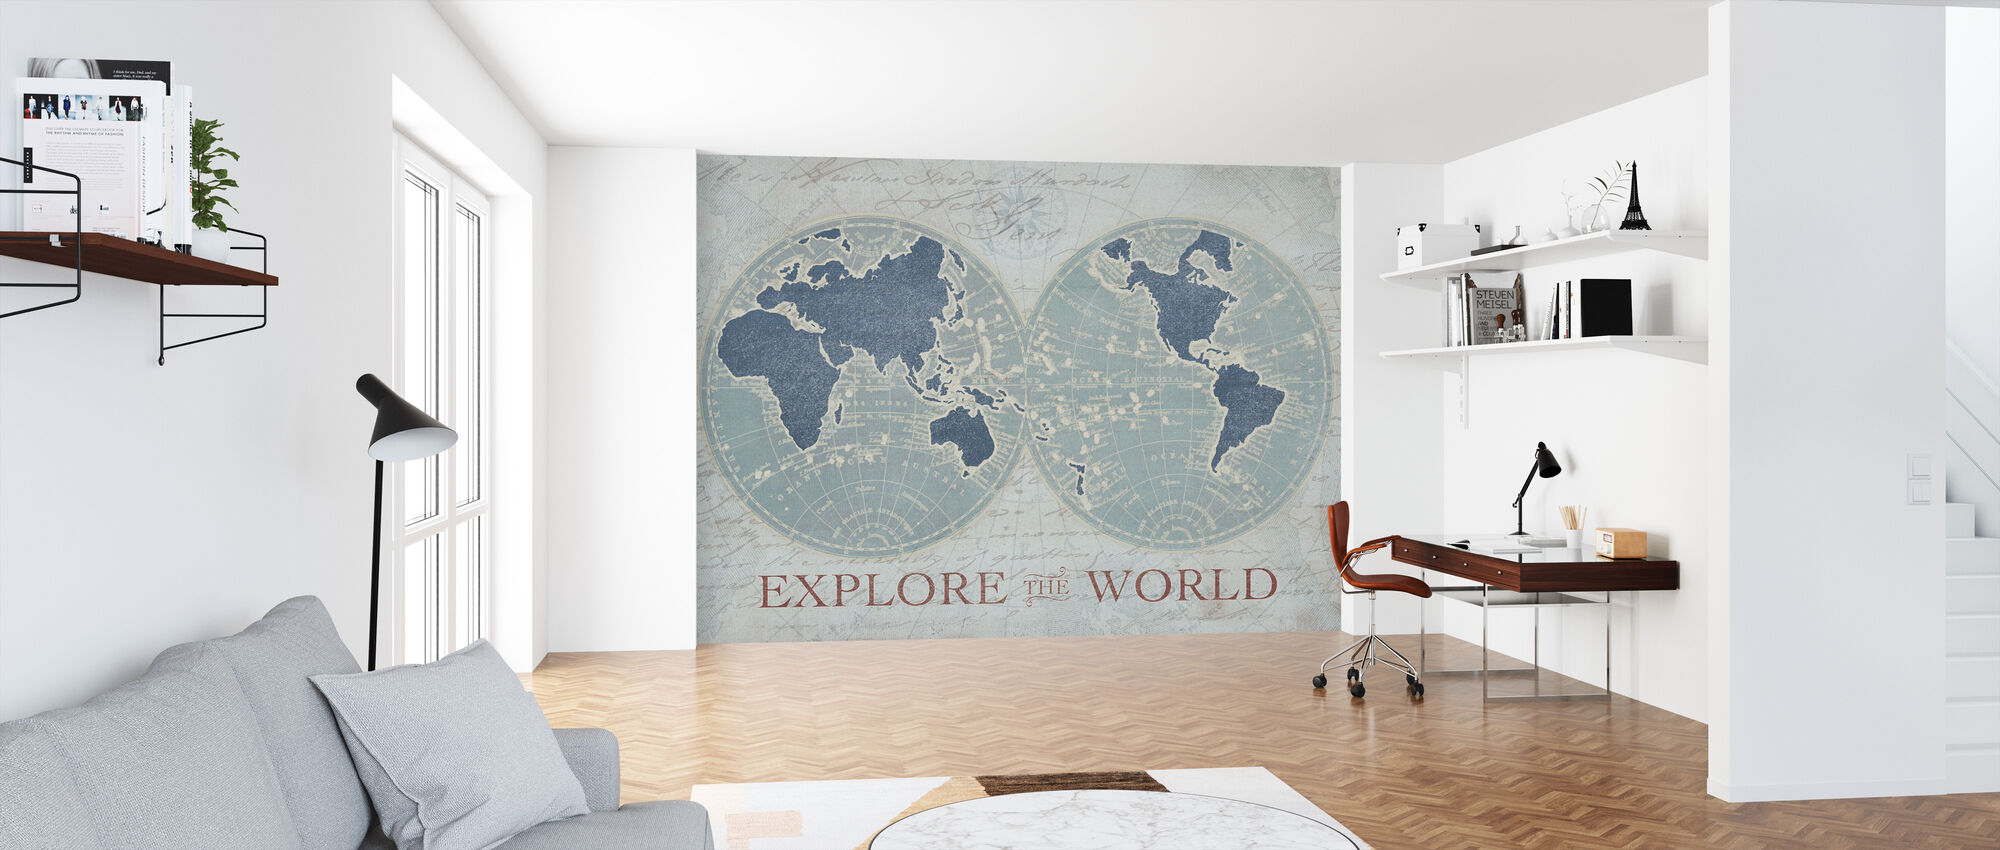 Explore the World 2 - Wallpaper - Office